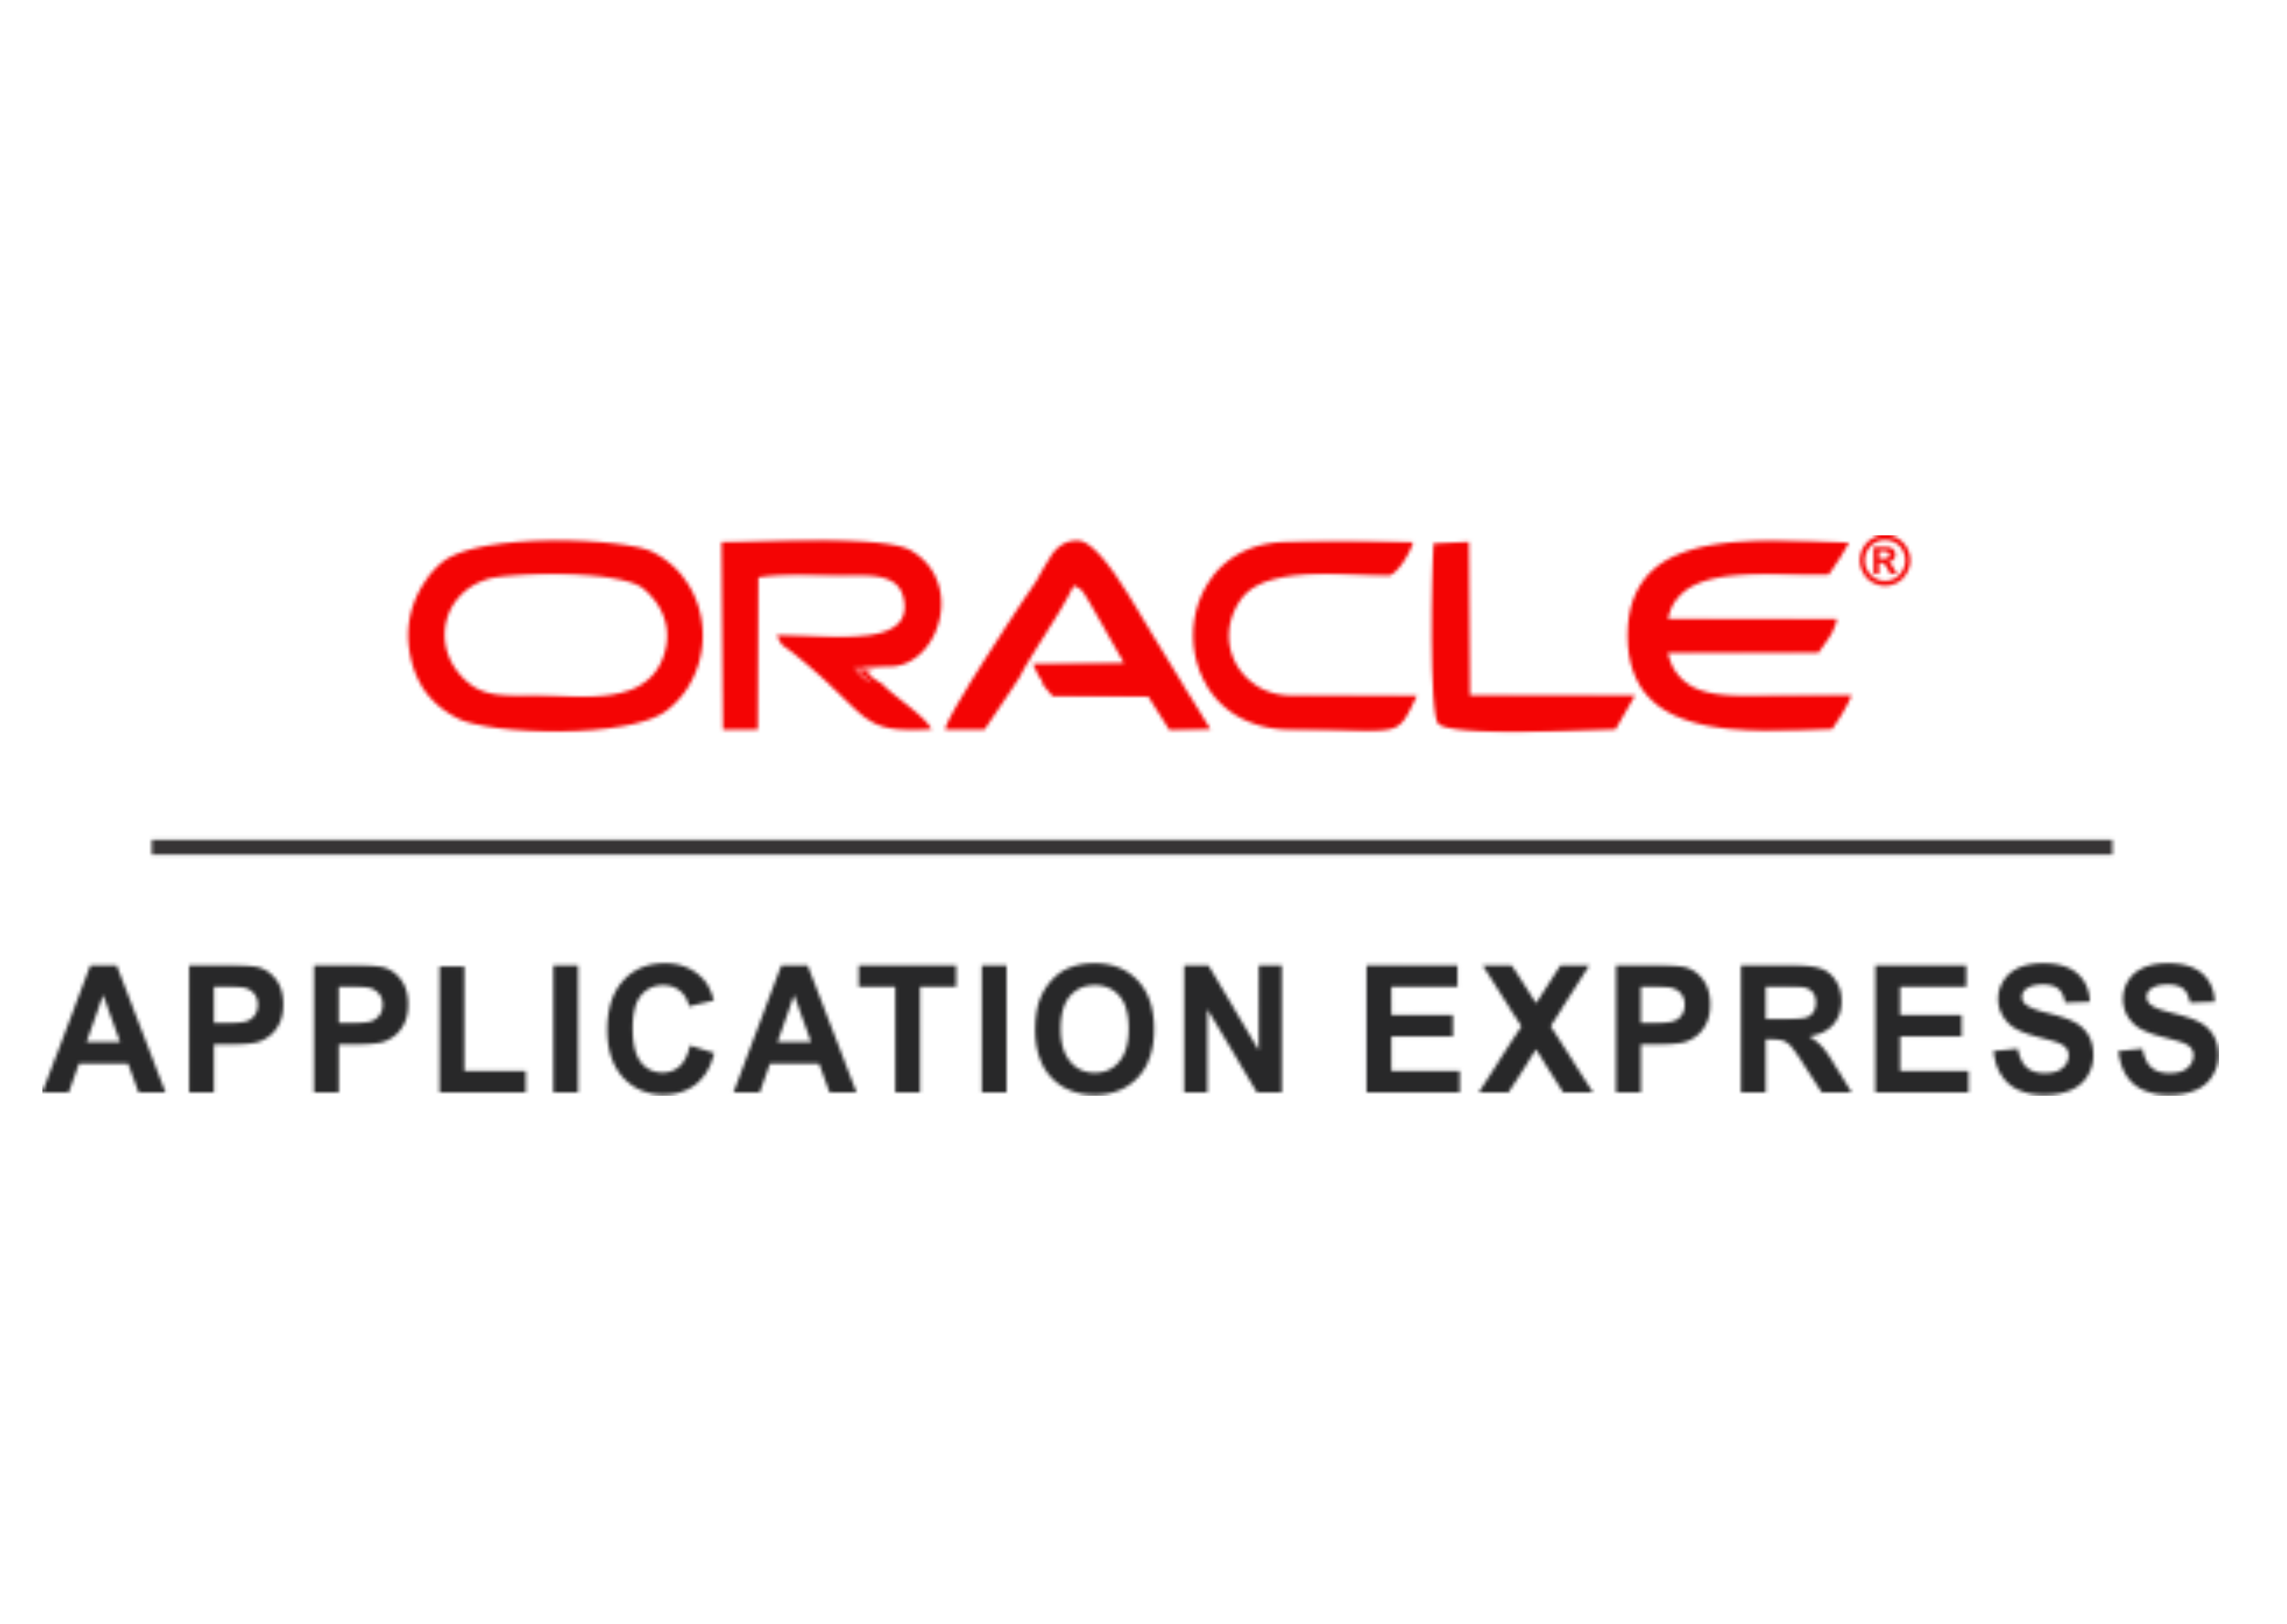 Oracle APEX beschikbaar als standalone OCI service